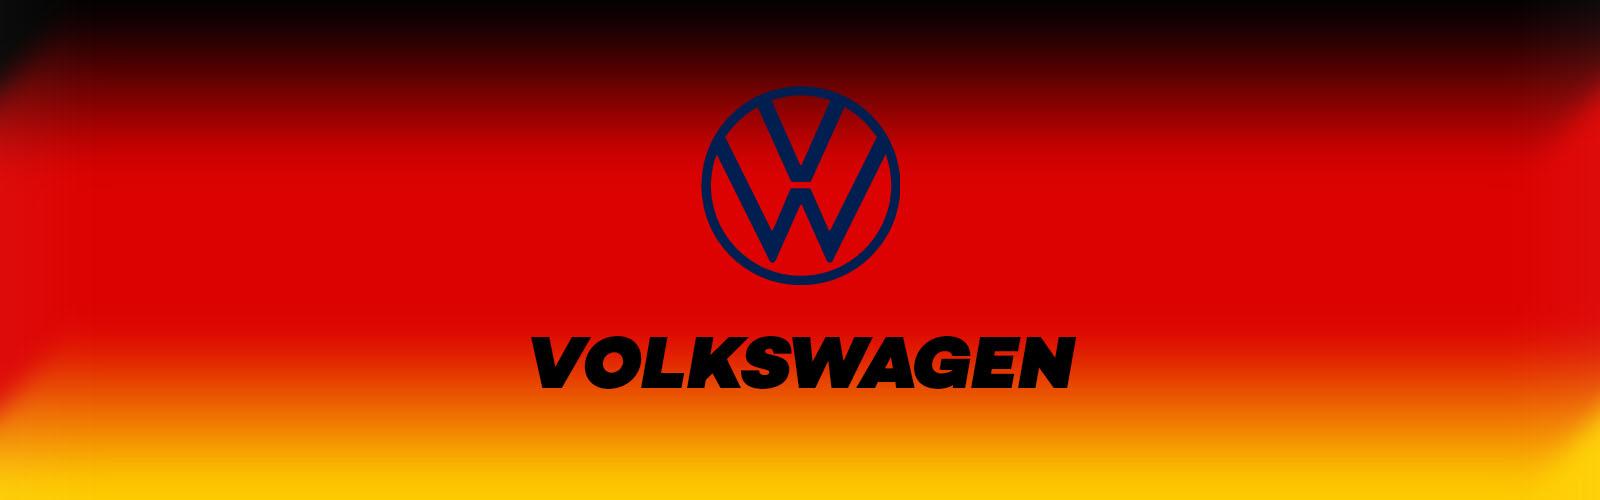 volkswagen logo marque